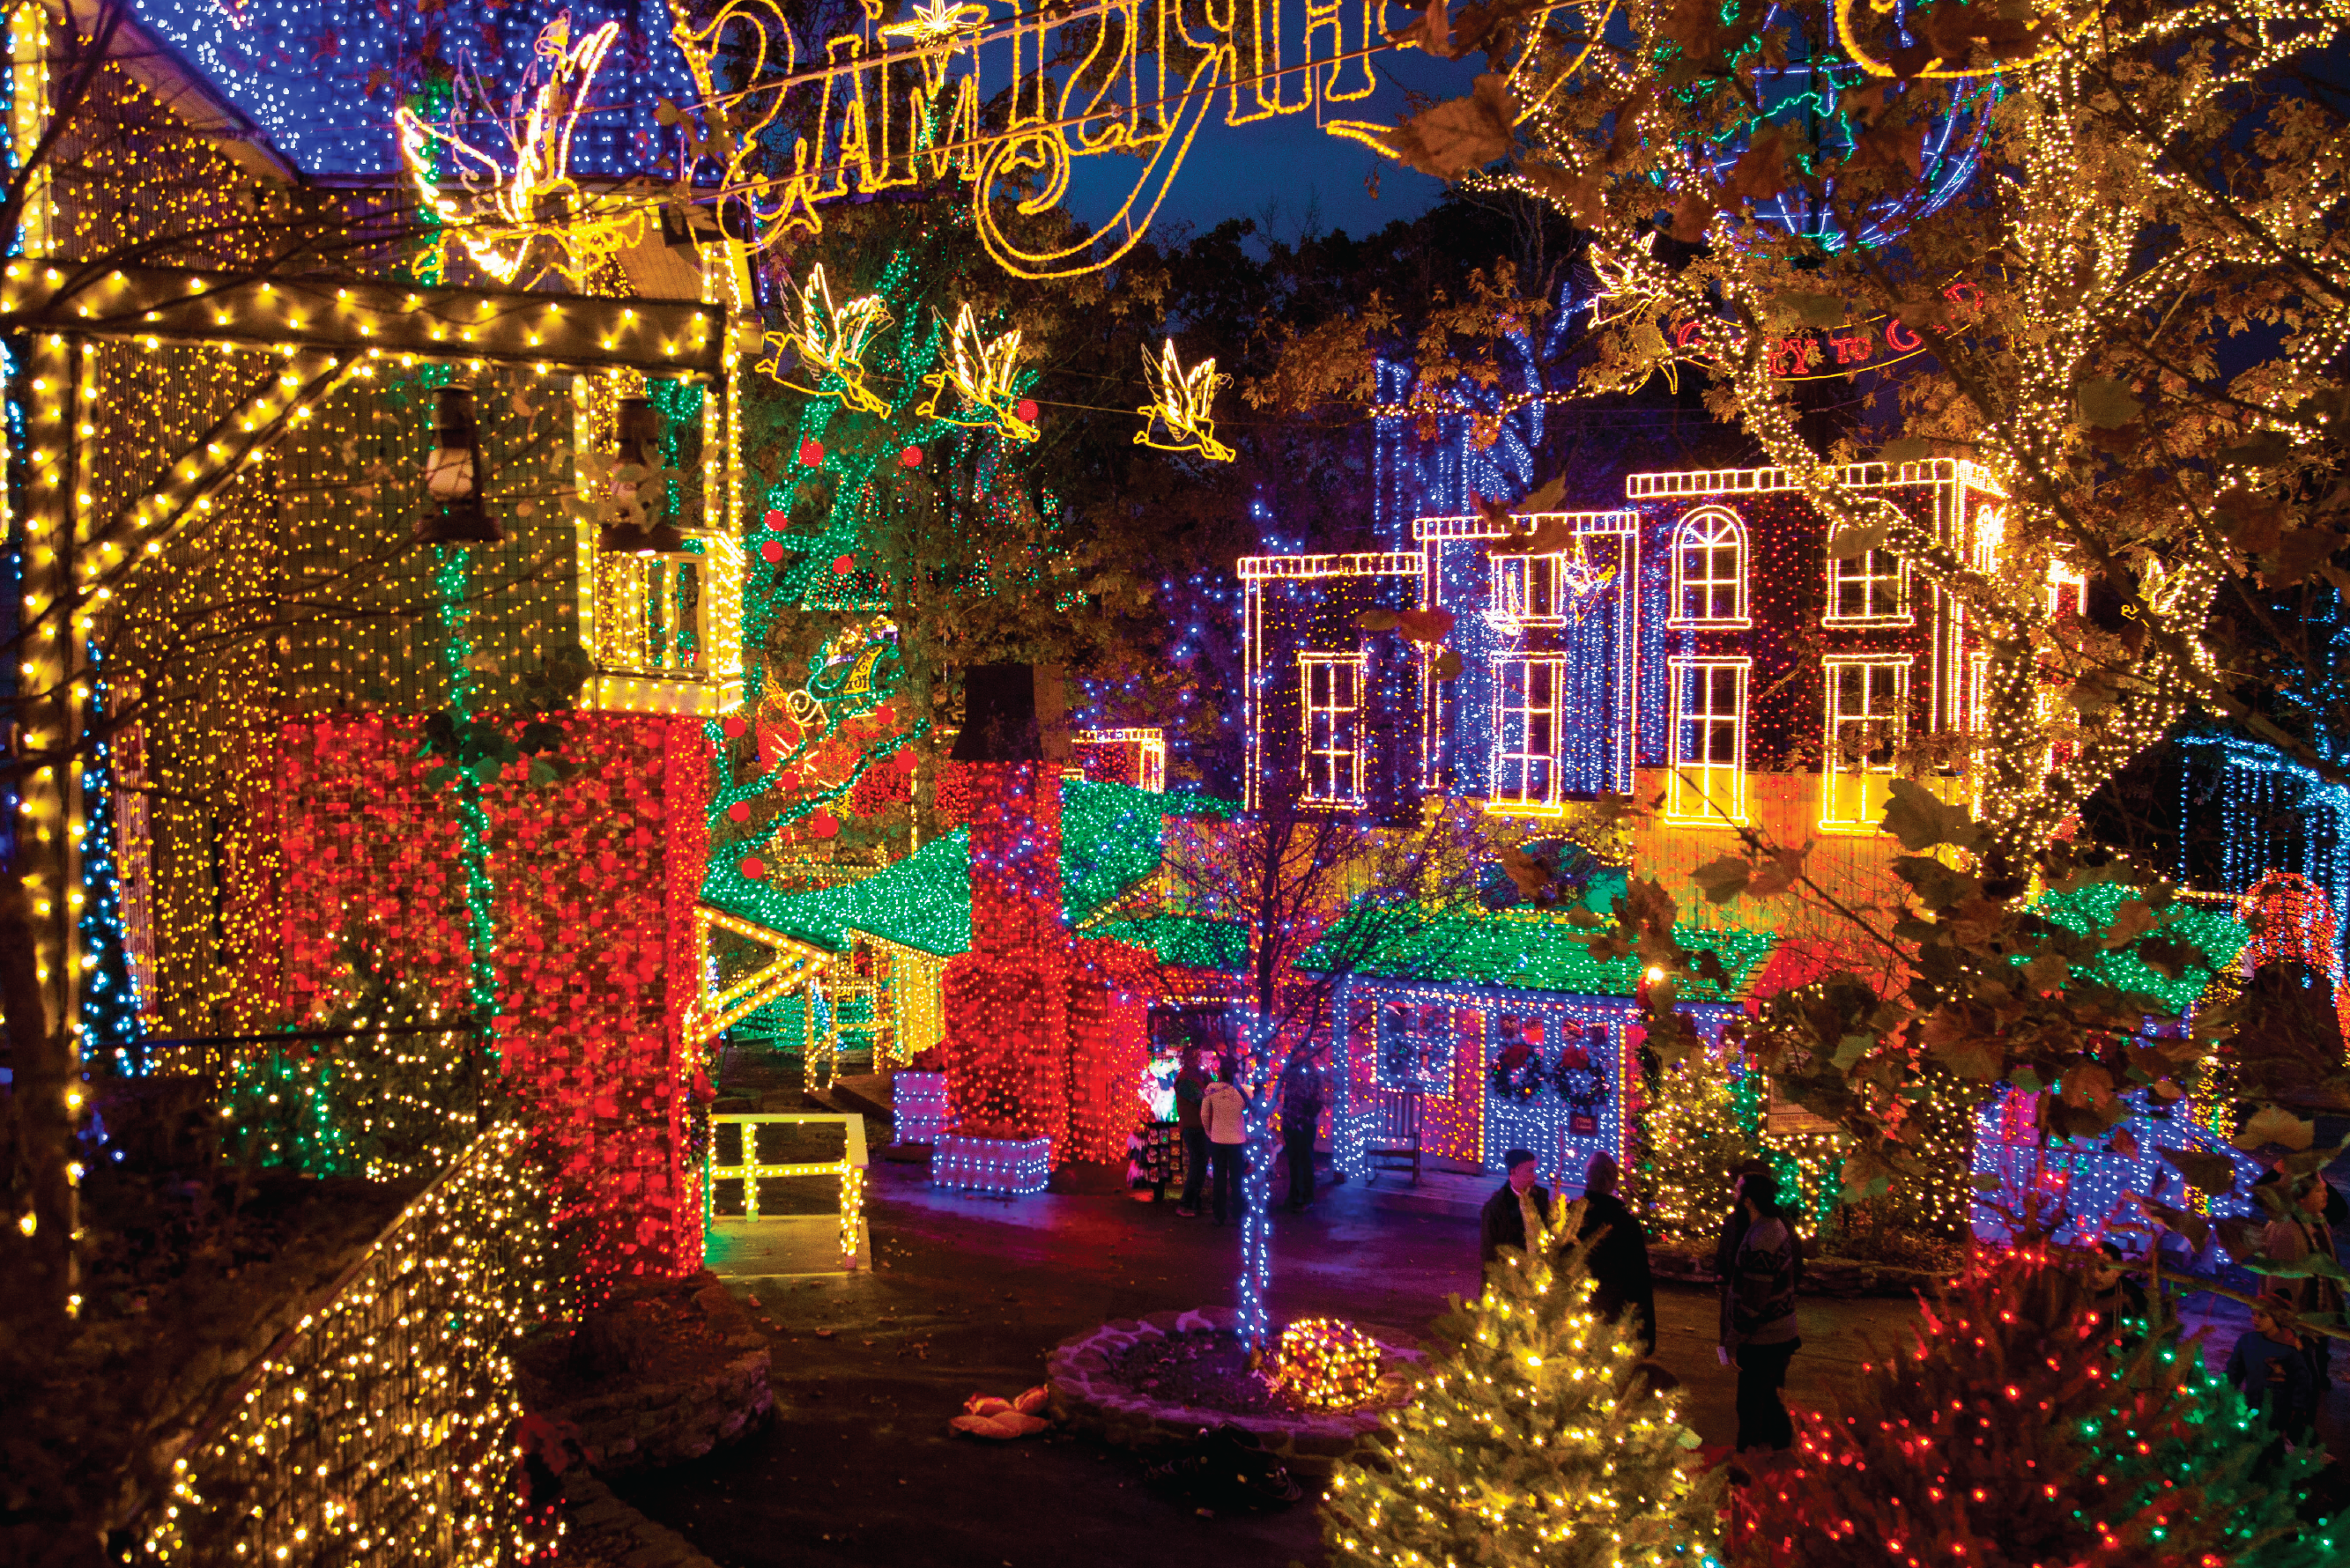 Silver Dollar City Christmas.Silver Dollar City Wins 1 Spot Best Theme Park Holiday